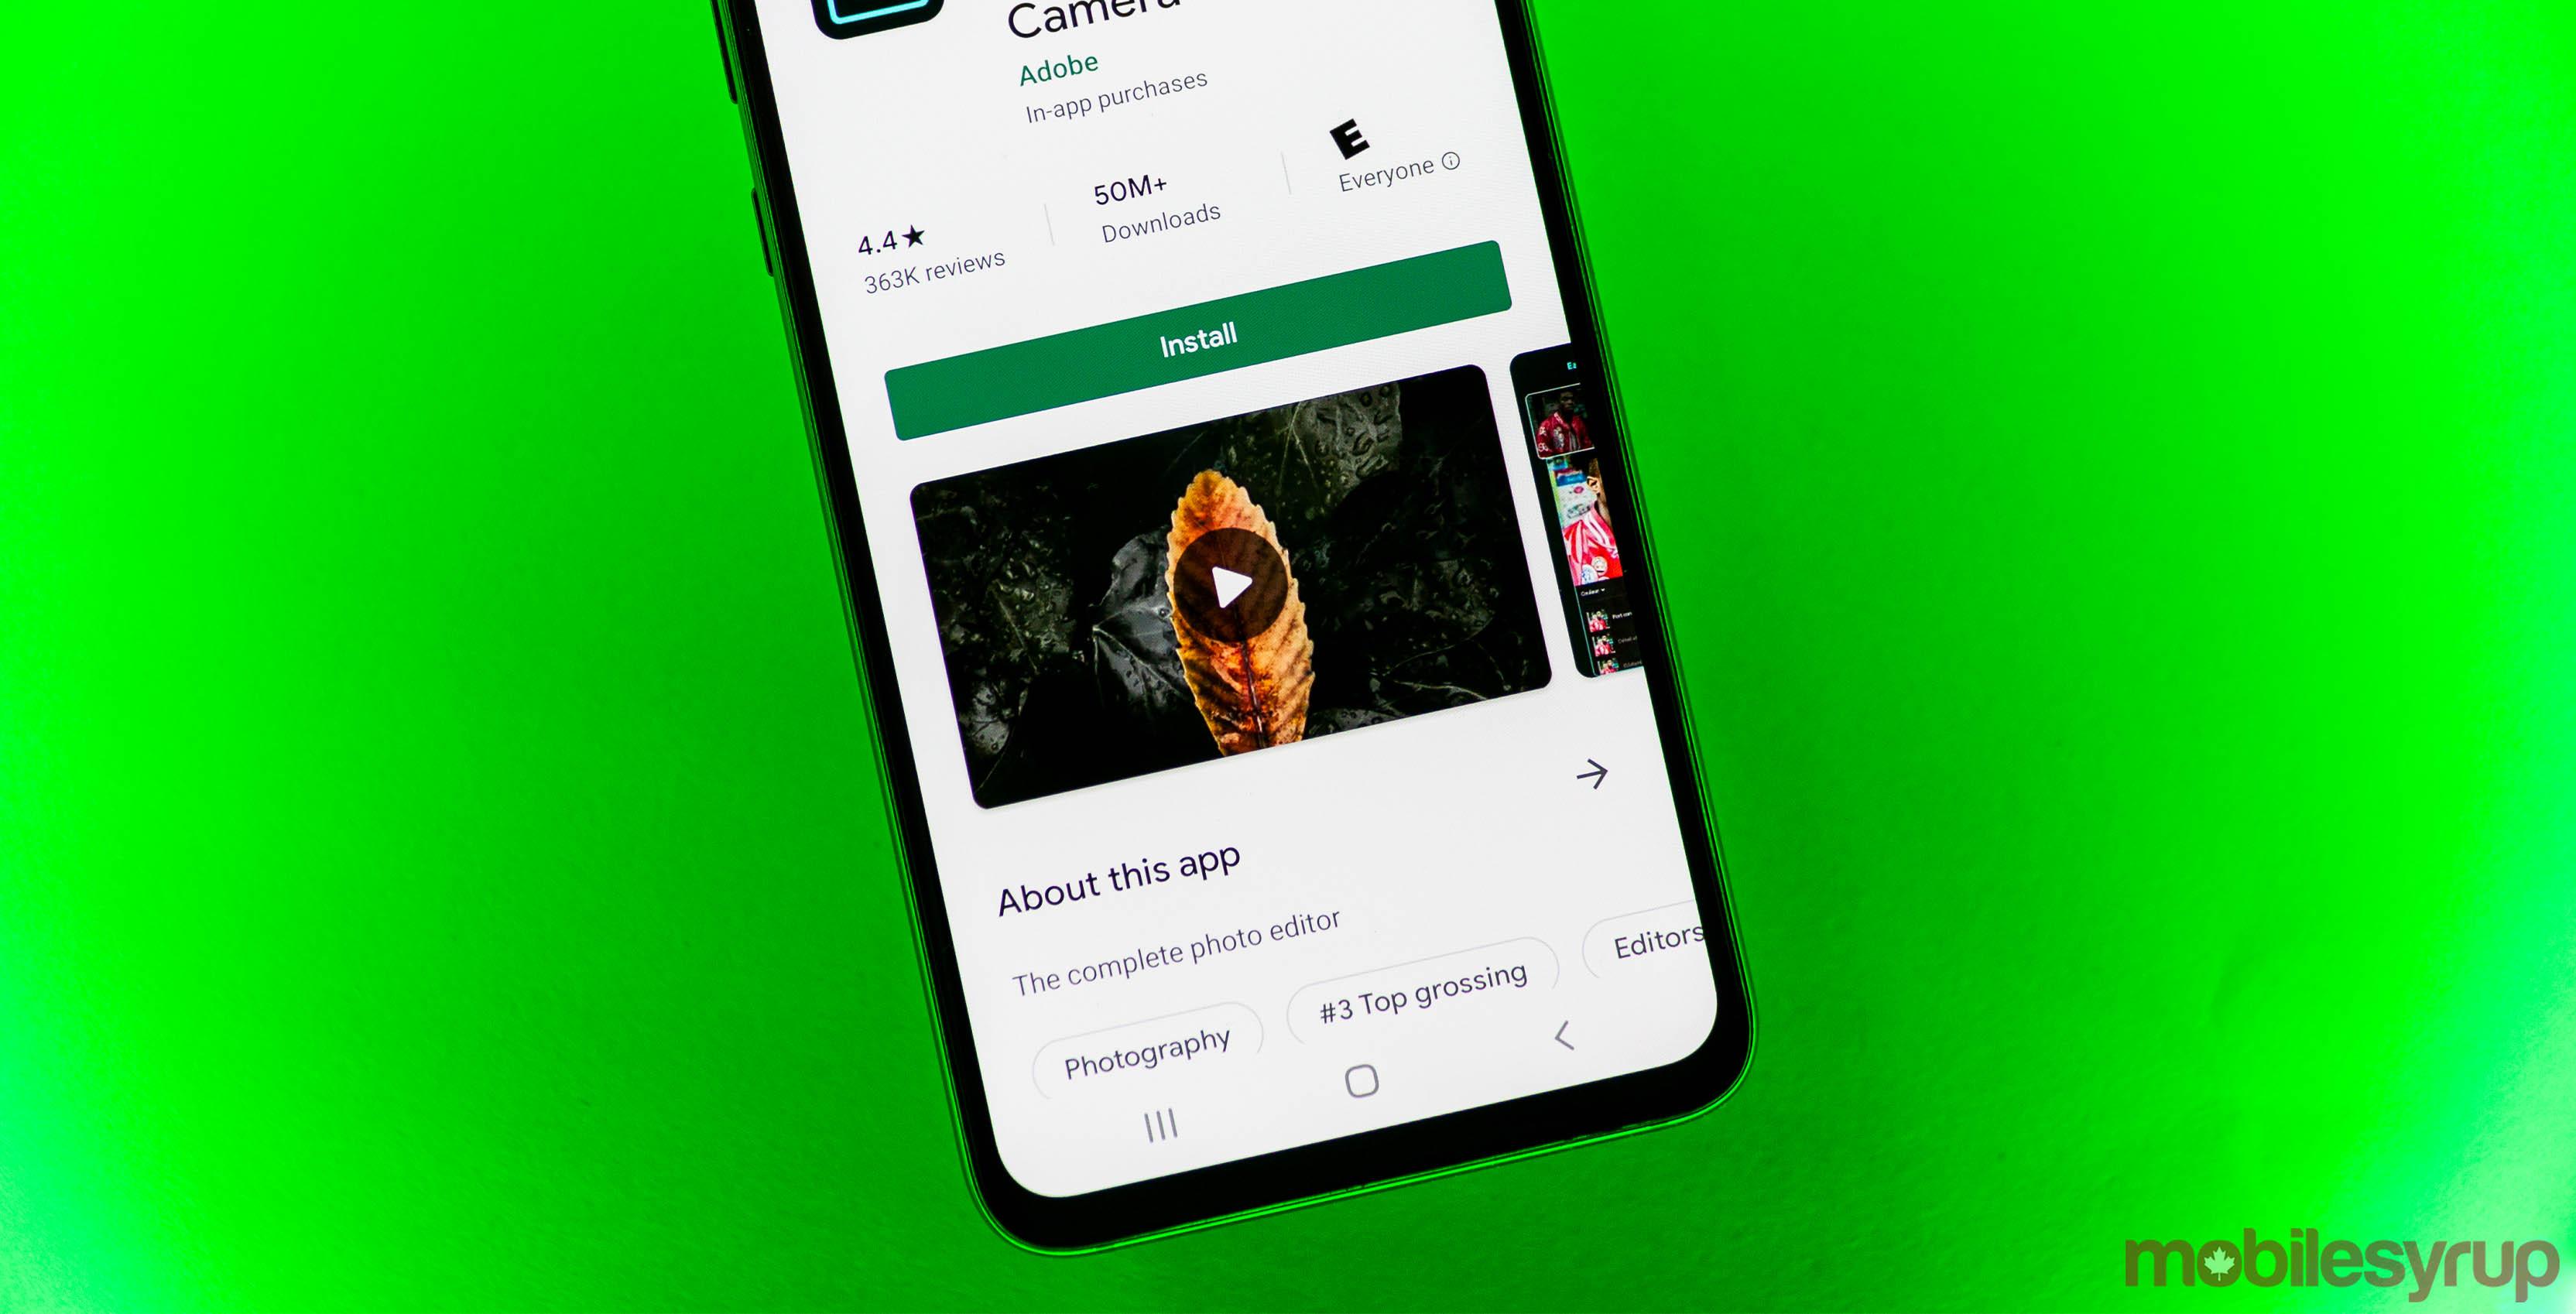 Google Play Store video